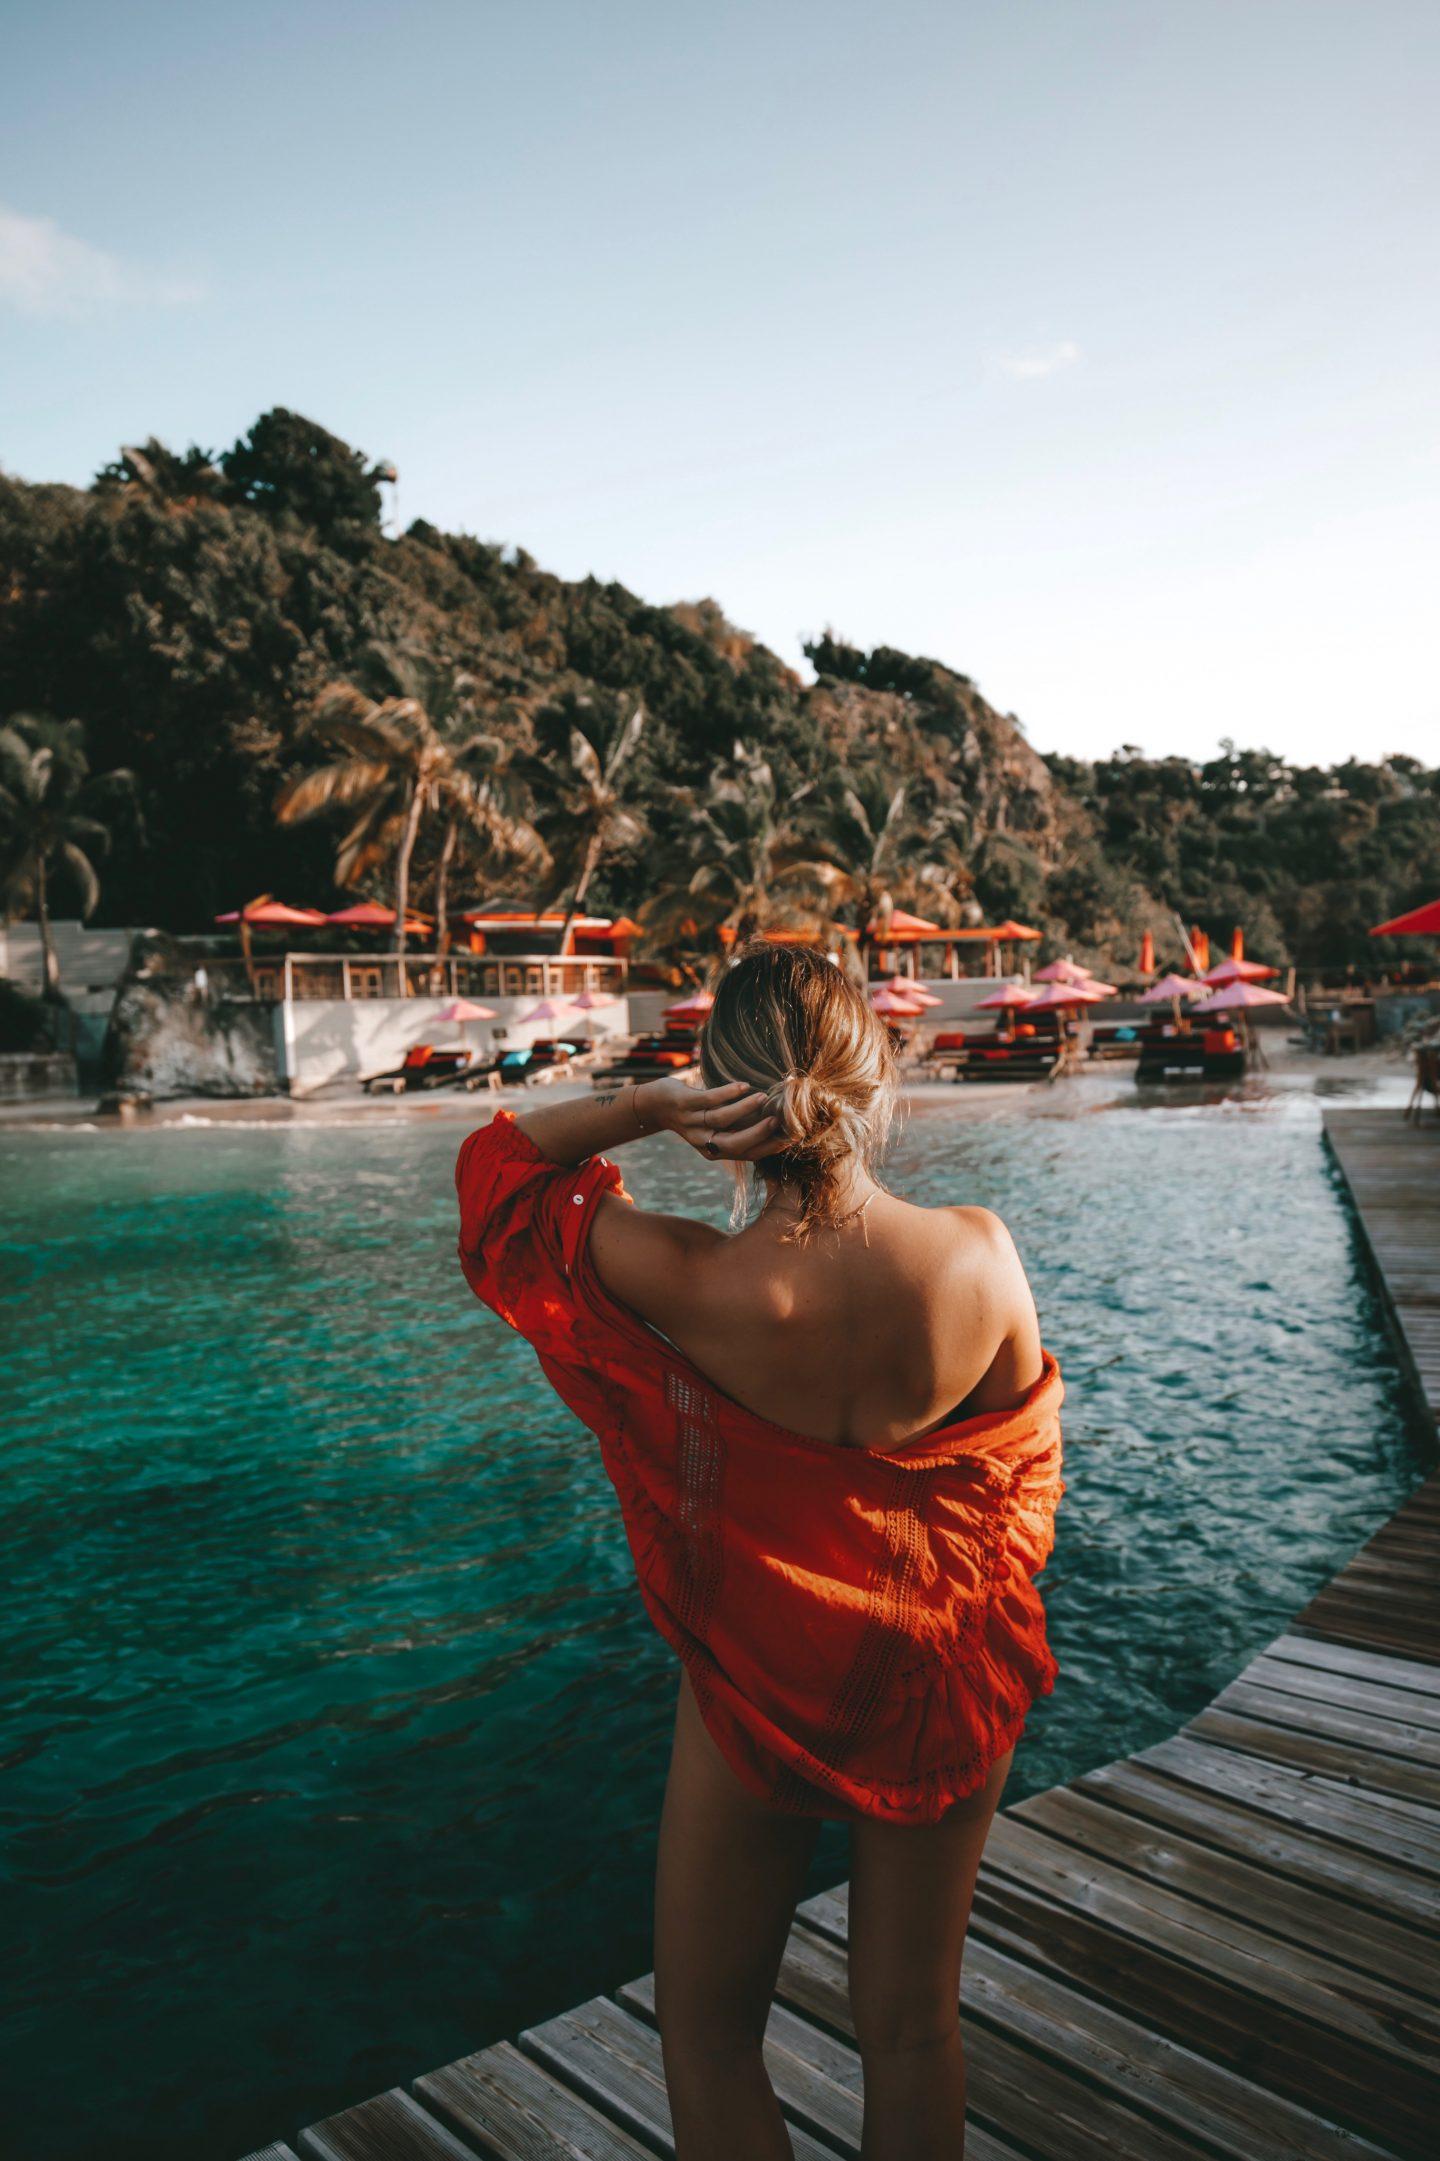 Hôtel Guadeloupe - Blondie Baby blog voyage et mode